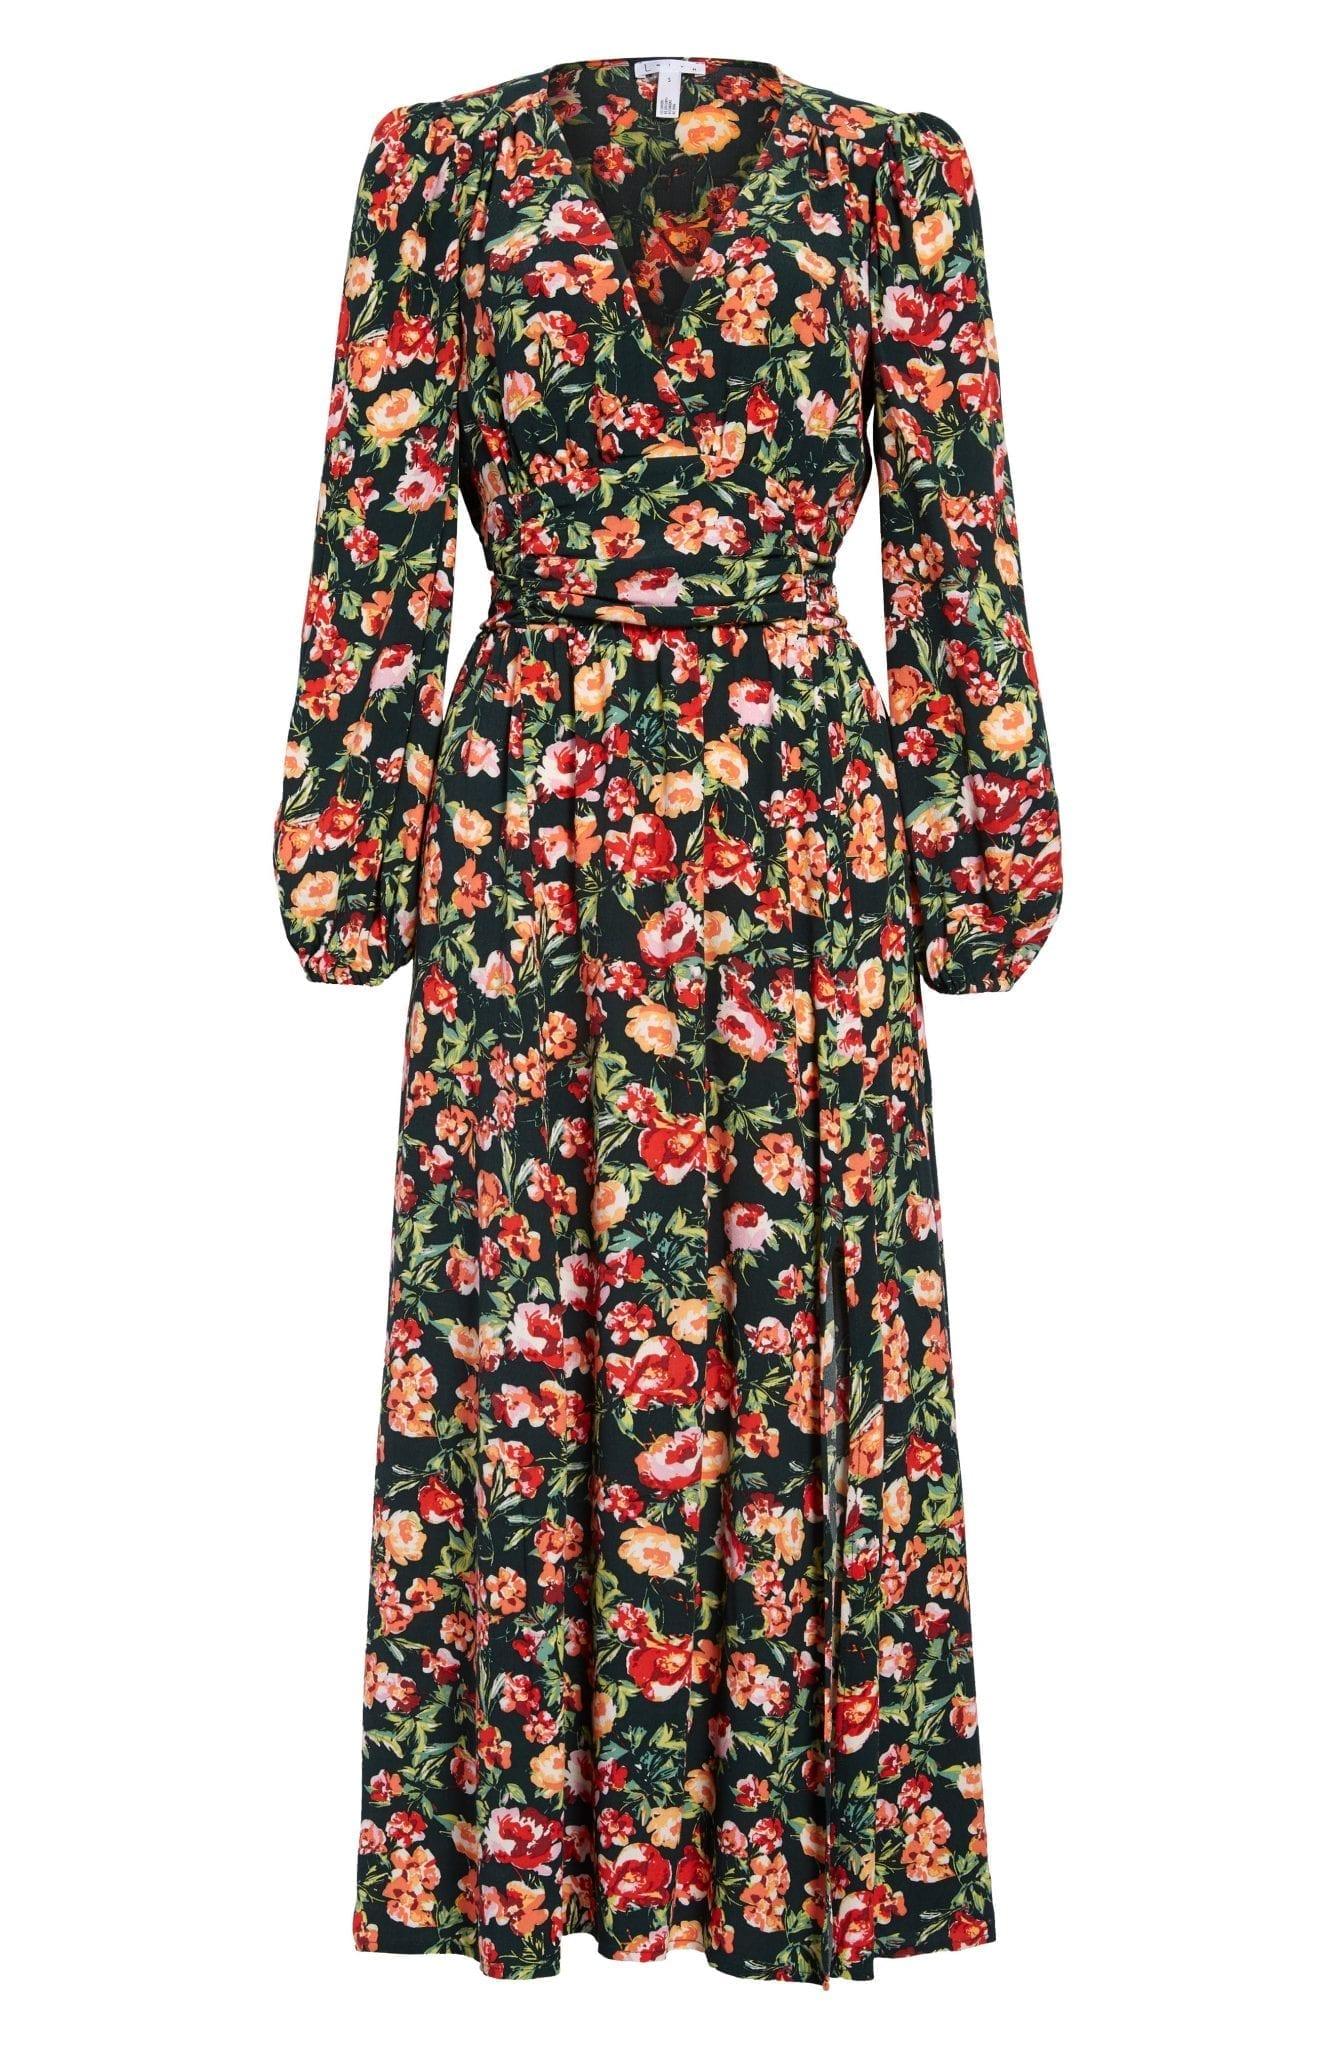 LEITH Long Sleeve Floral Print Dress